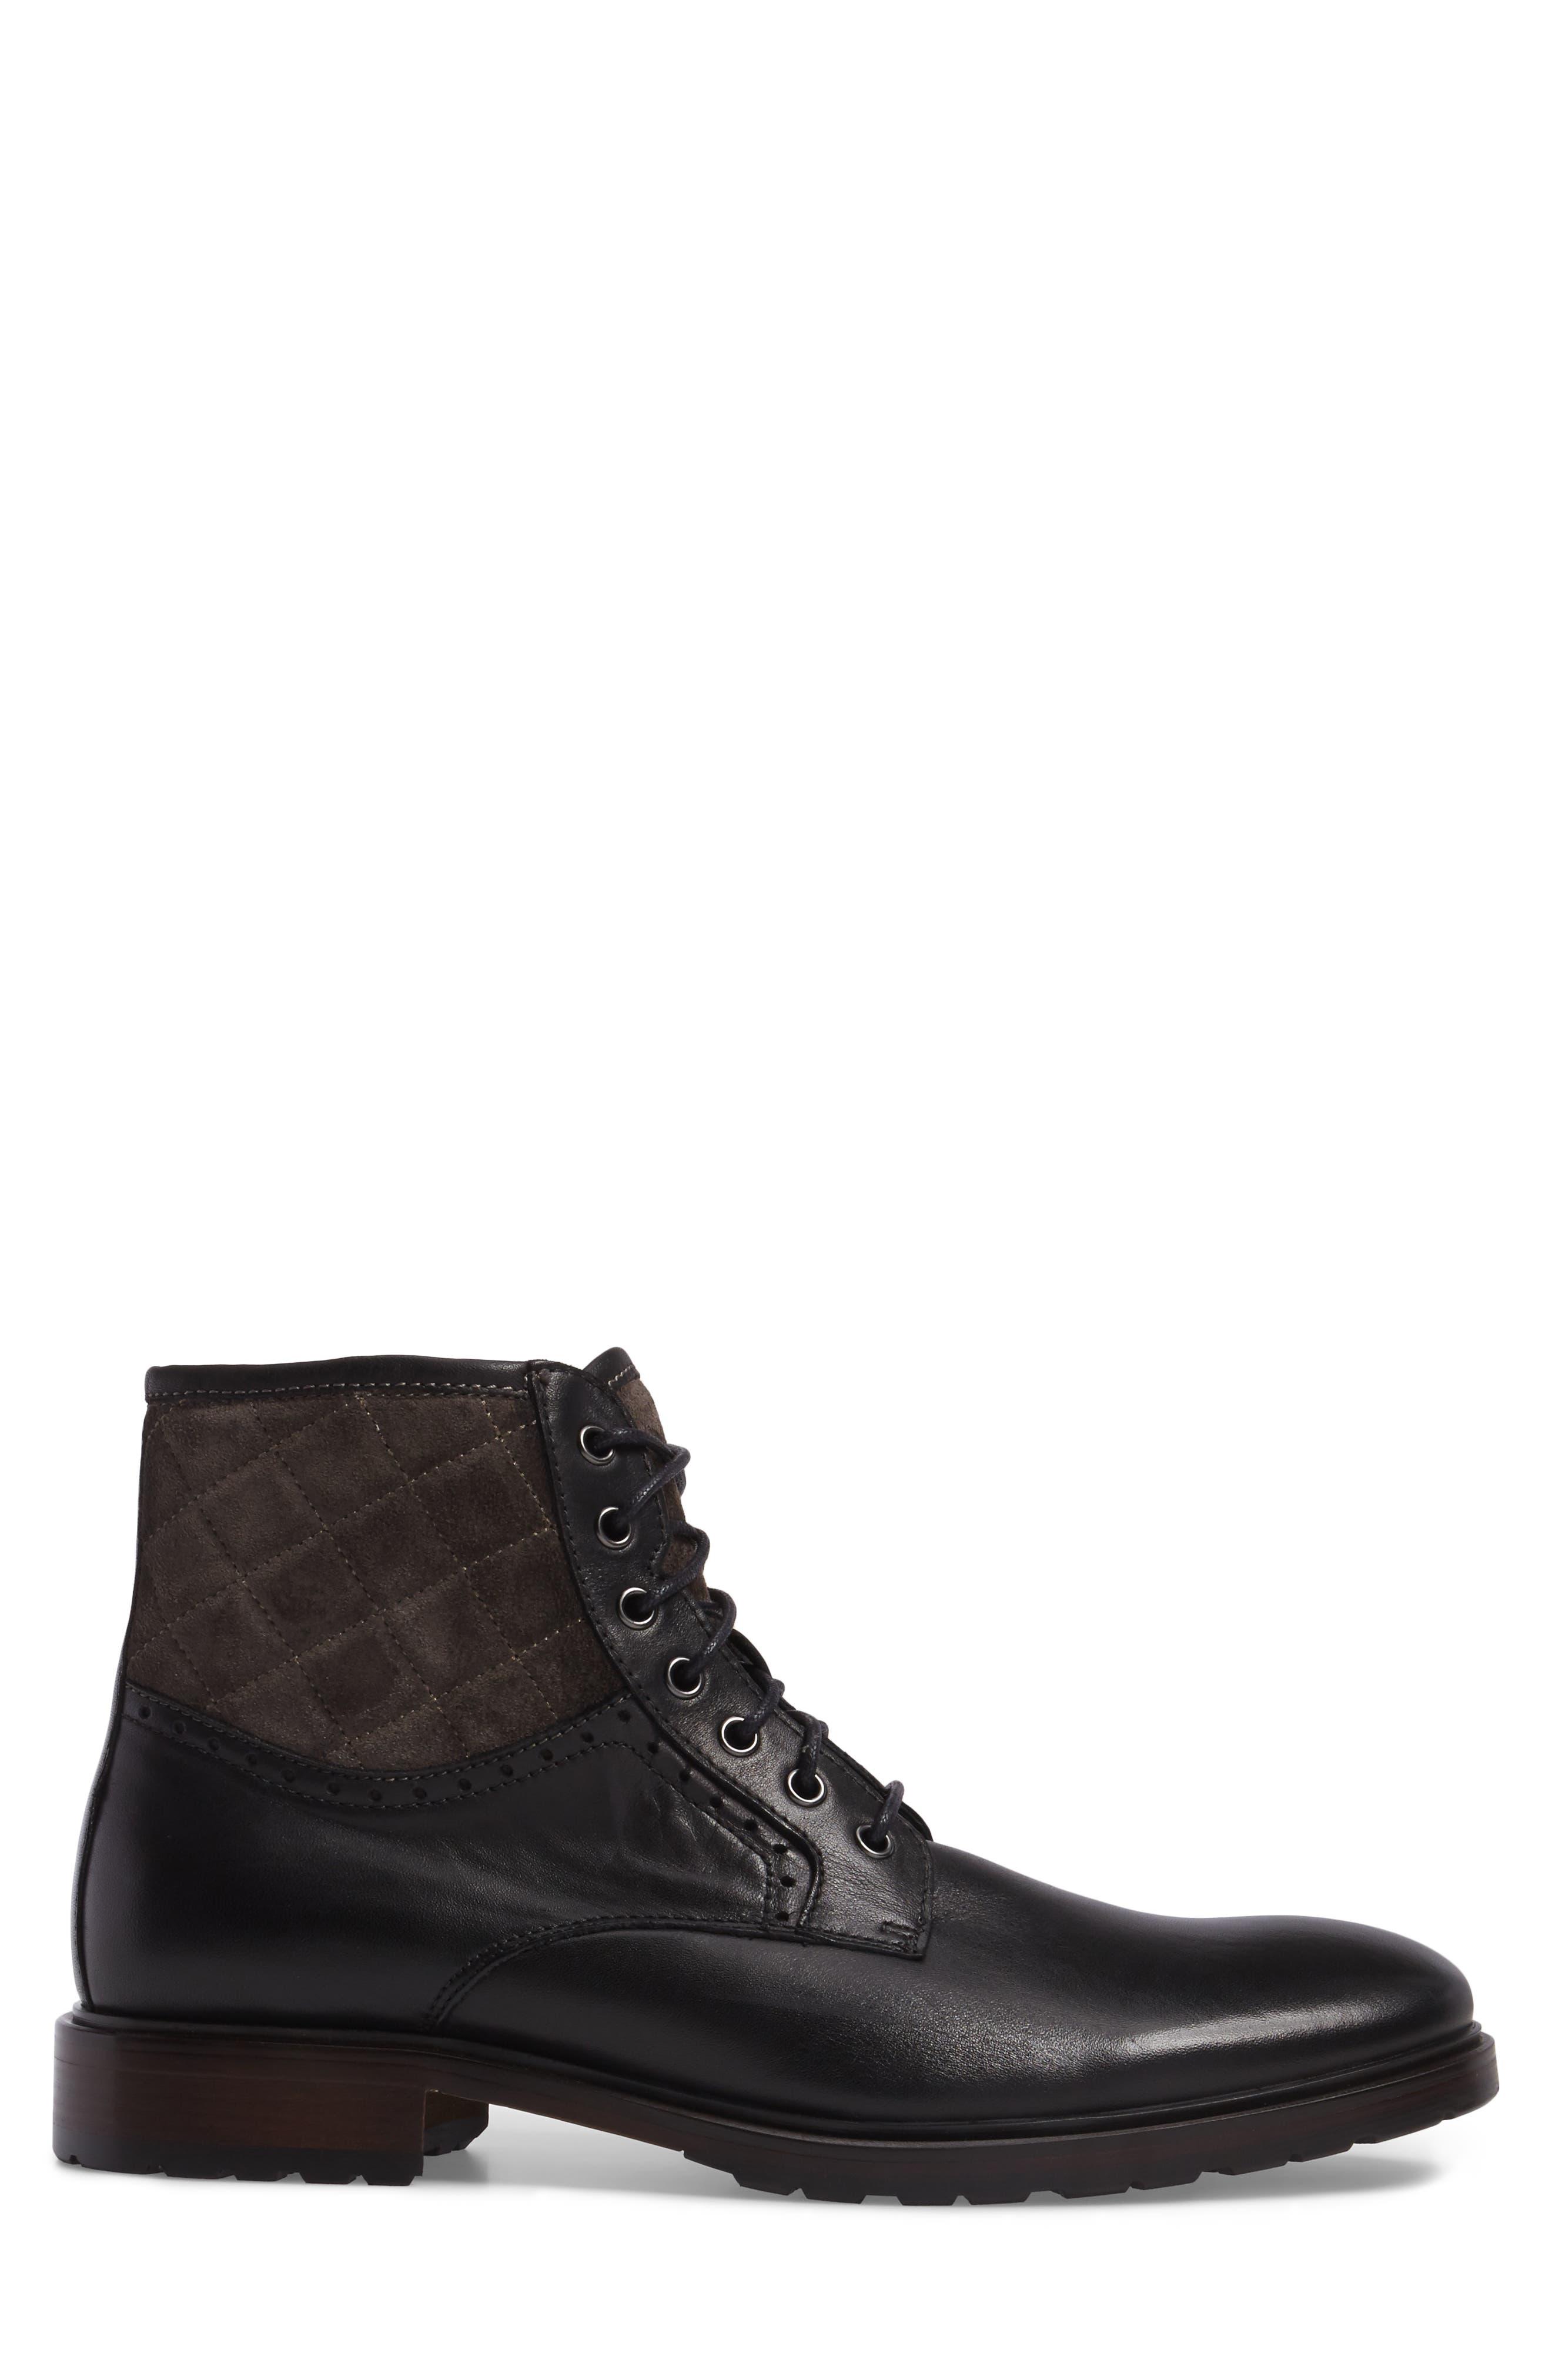 Myles Plain Toe Boot,                             Alternate thumbnail 3, color,                             Black Leather